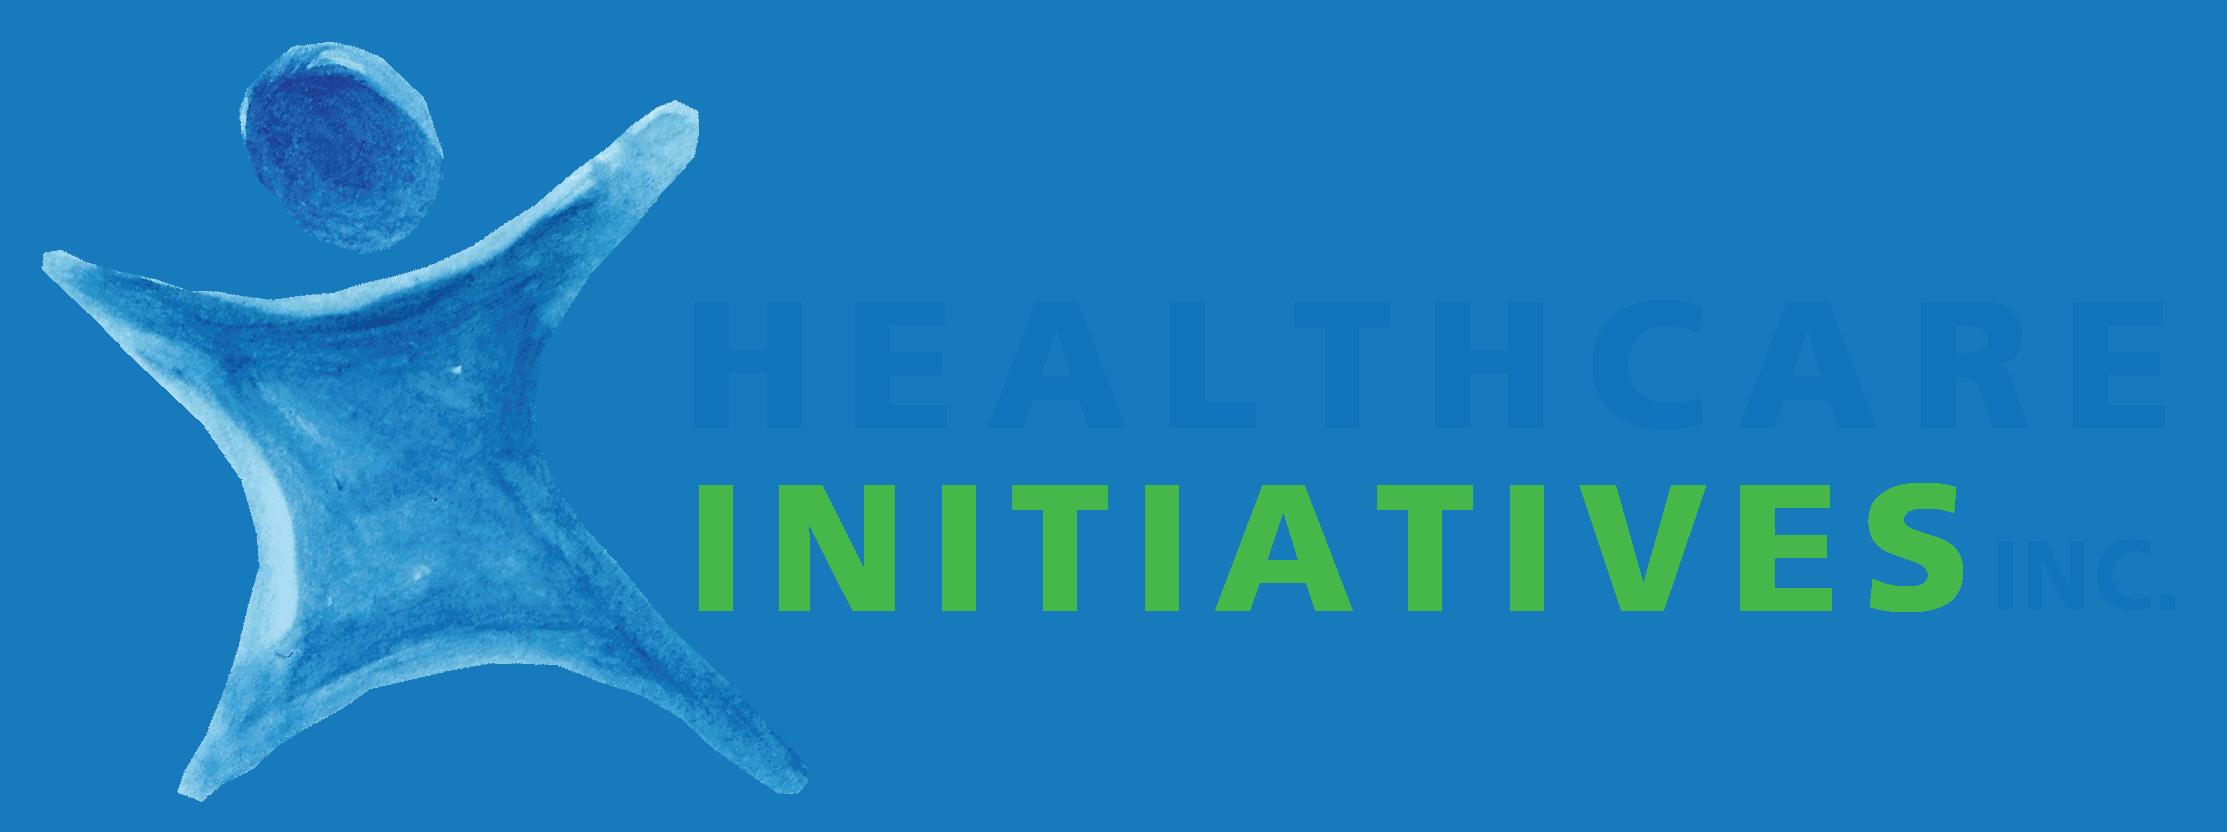 Healthcare Initiatives Inc.